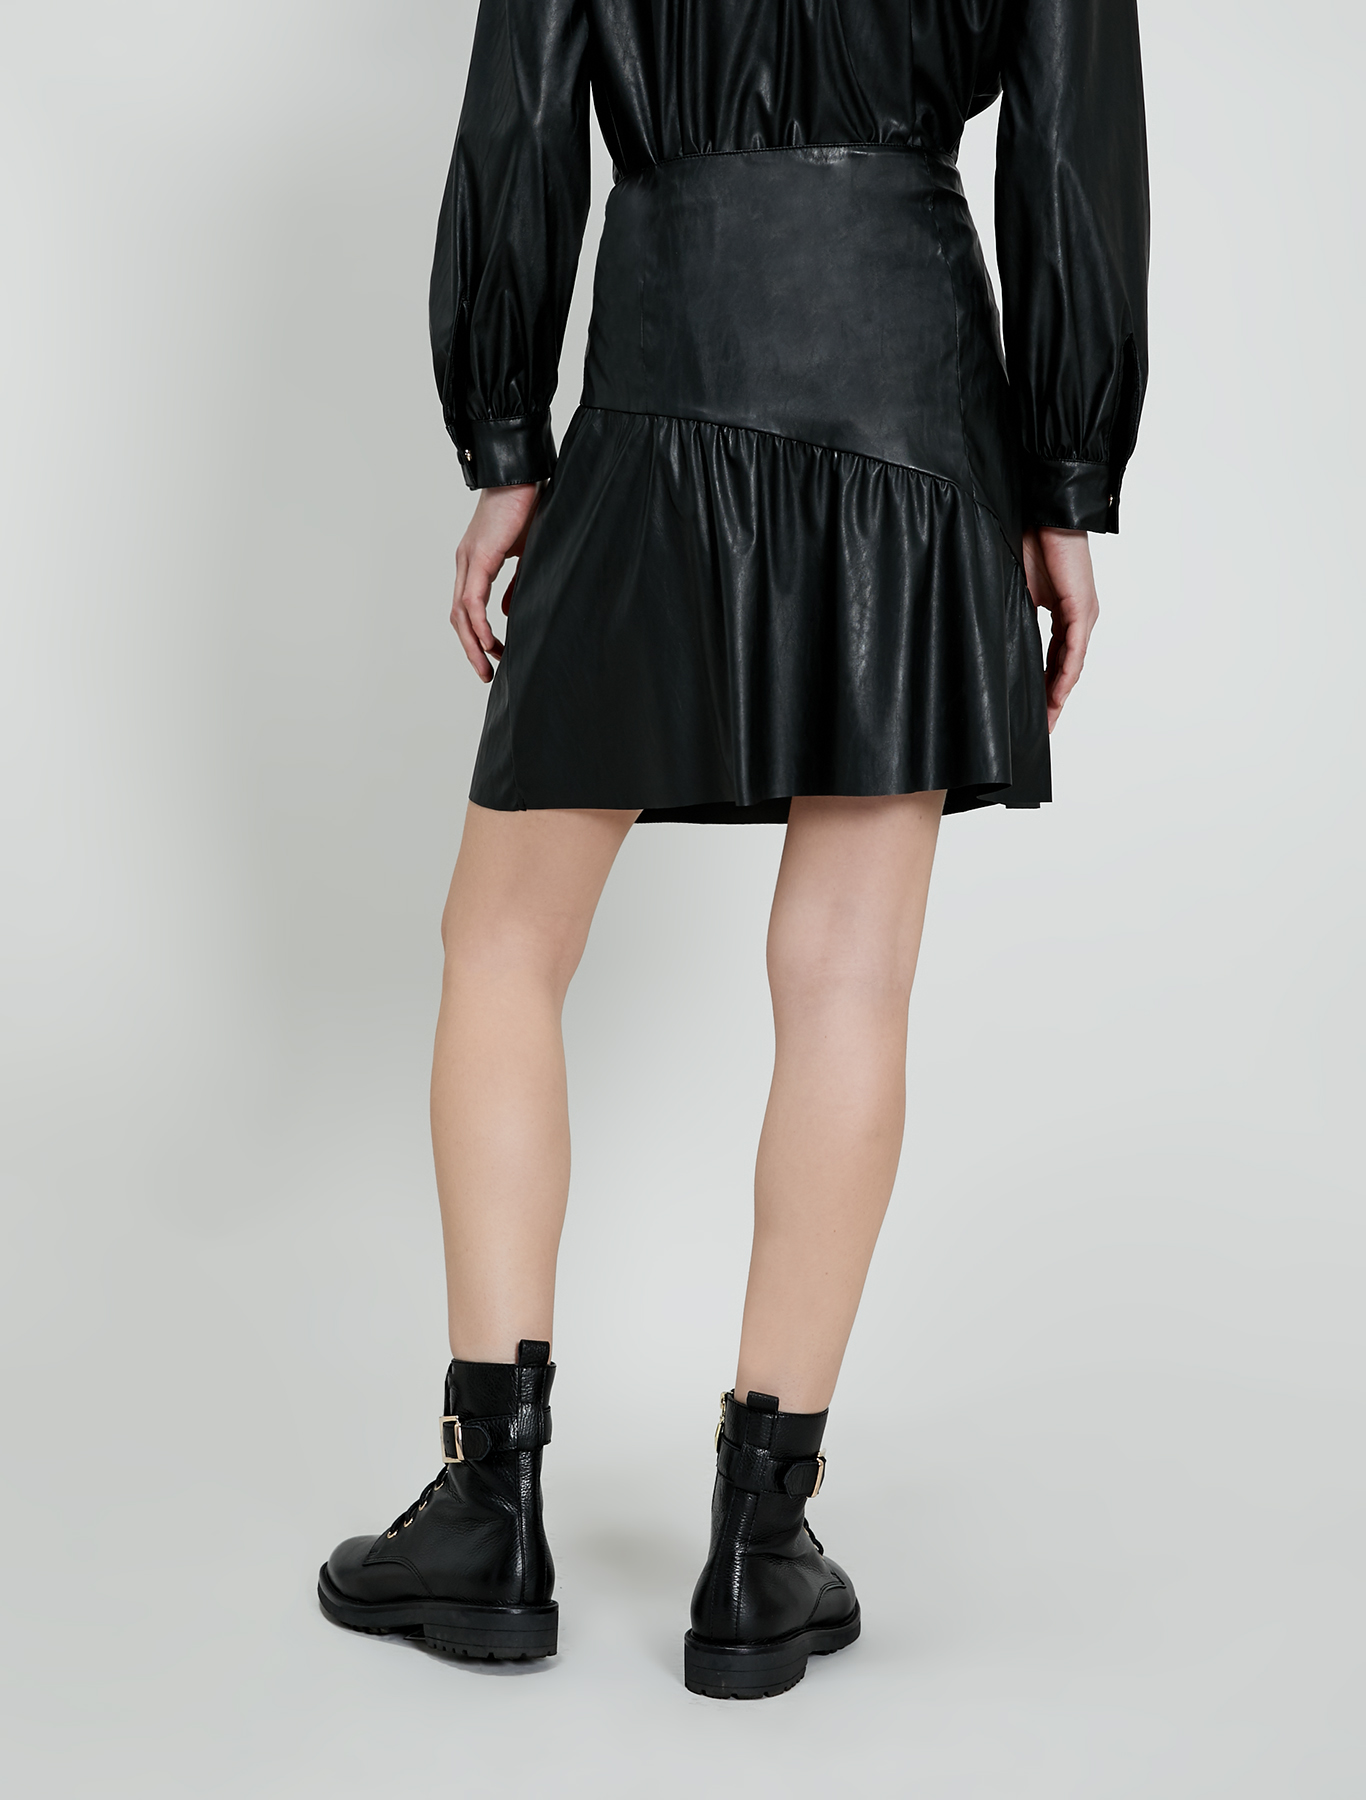 Coated jersey skirt - black - pennyblack